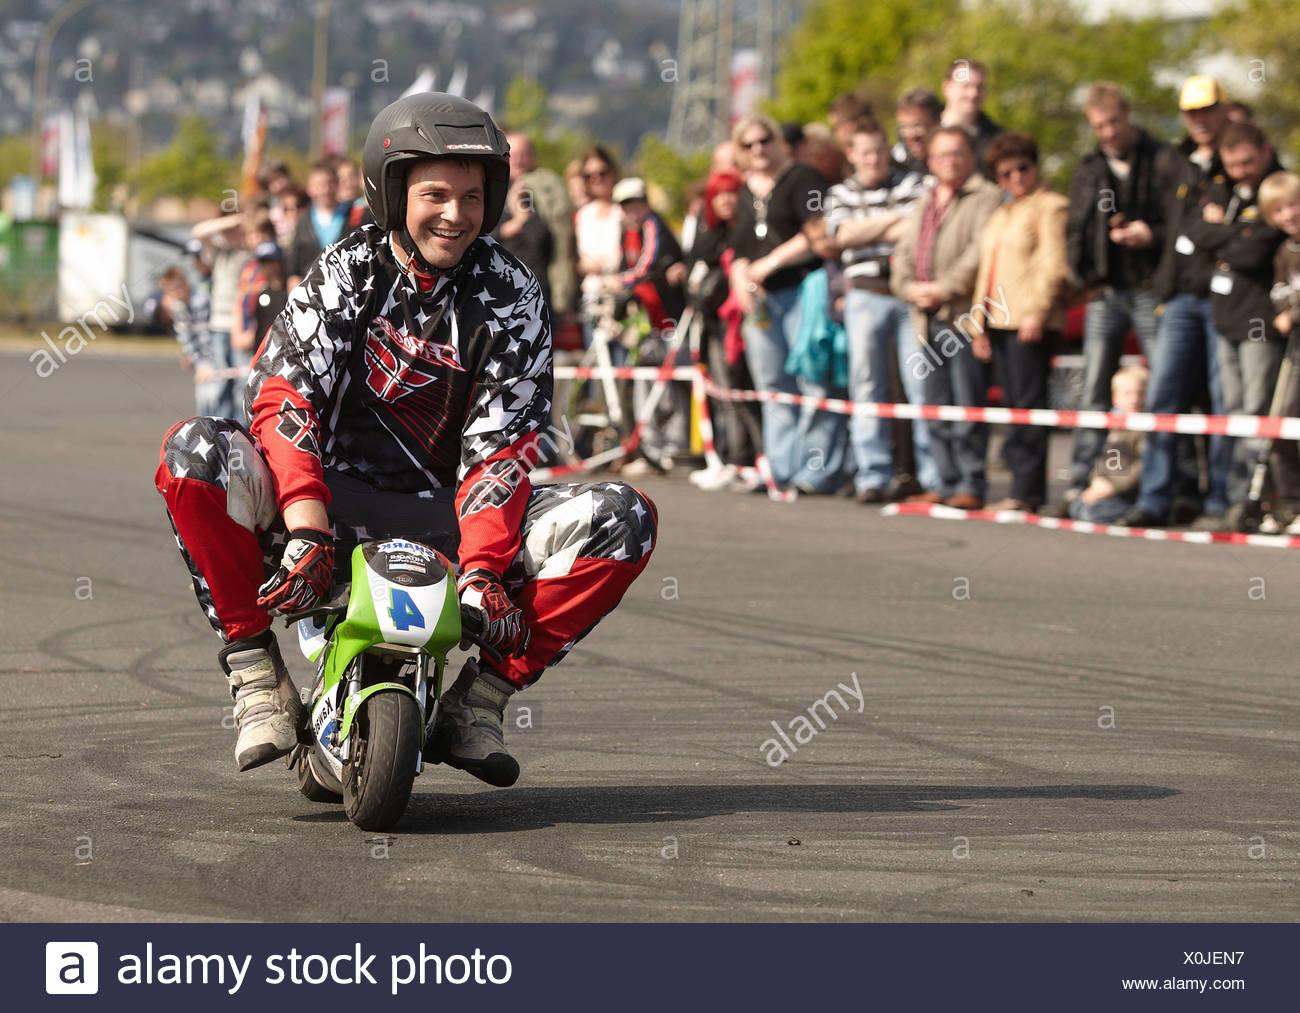 Motorcycle stuntman Mike Auffenberg riding a pocket bike, Koblenz, Rhineland-Palatinate - Stock Image